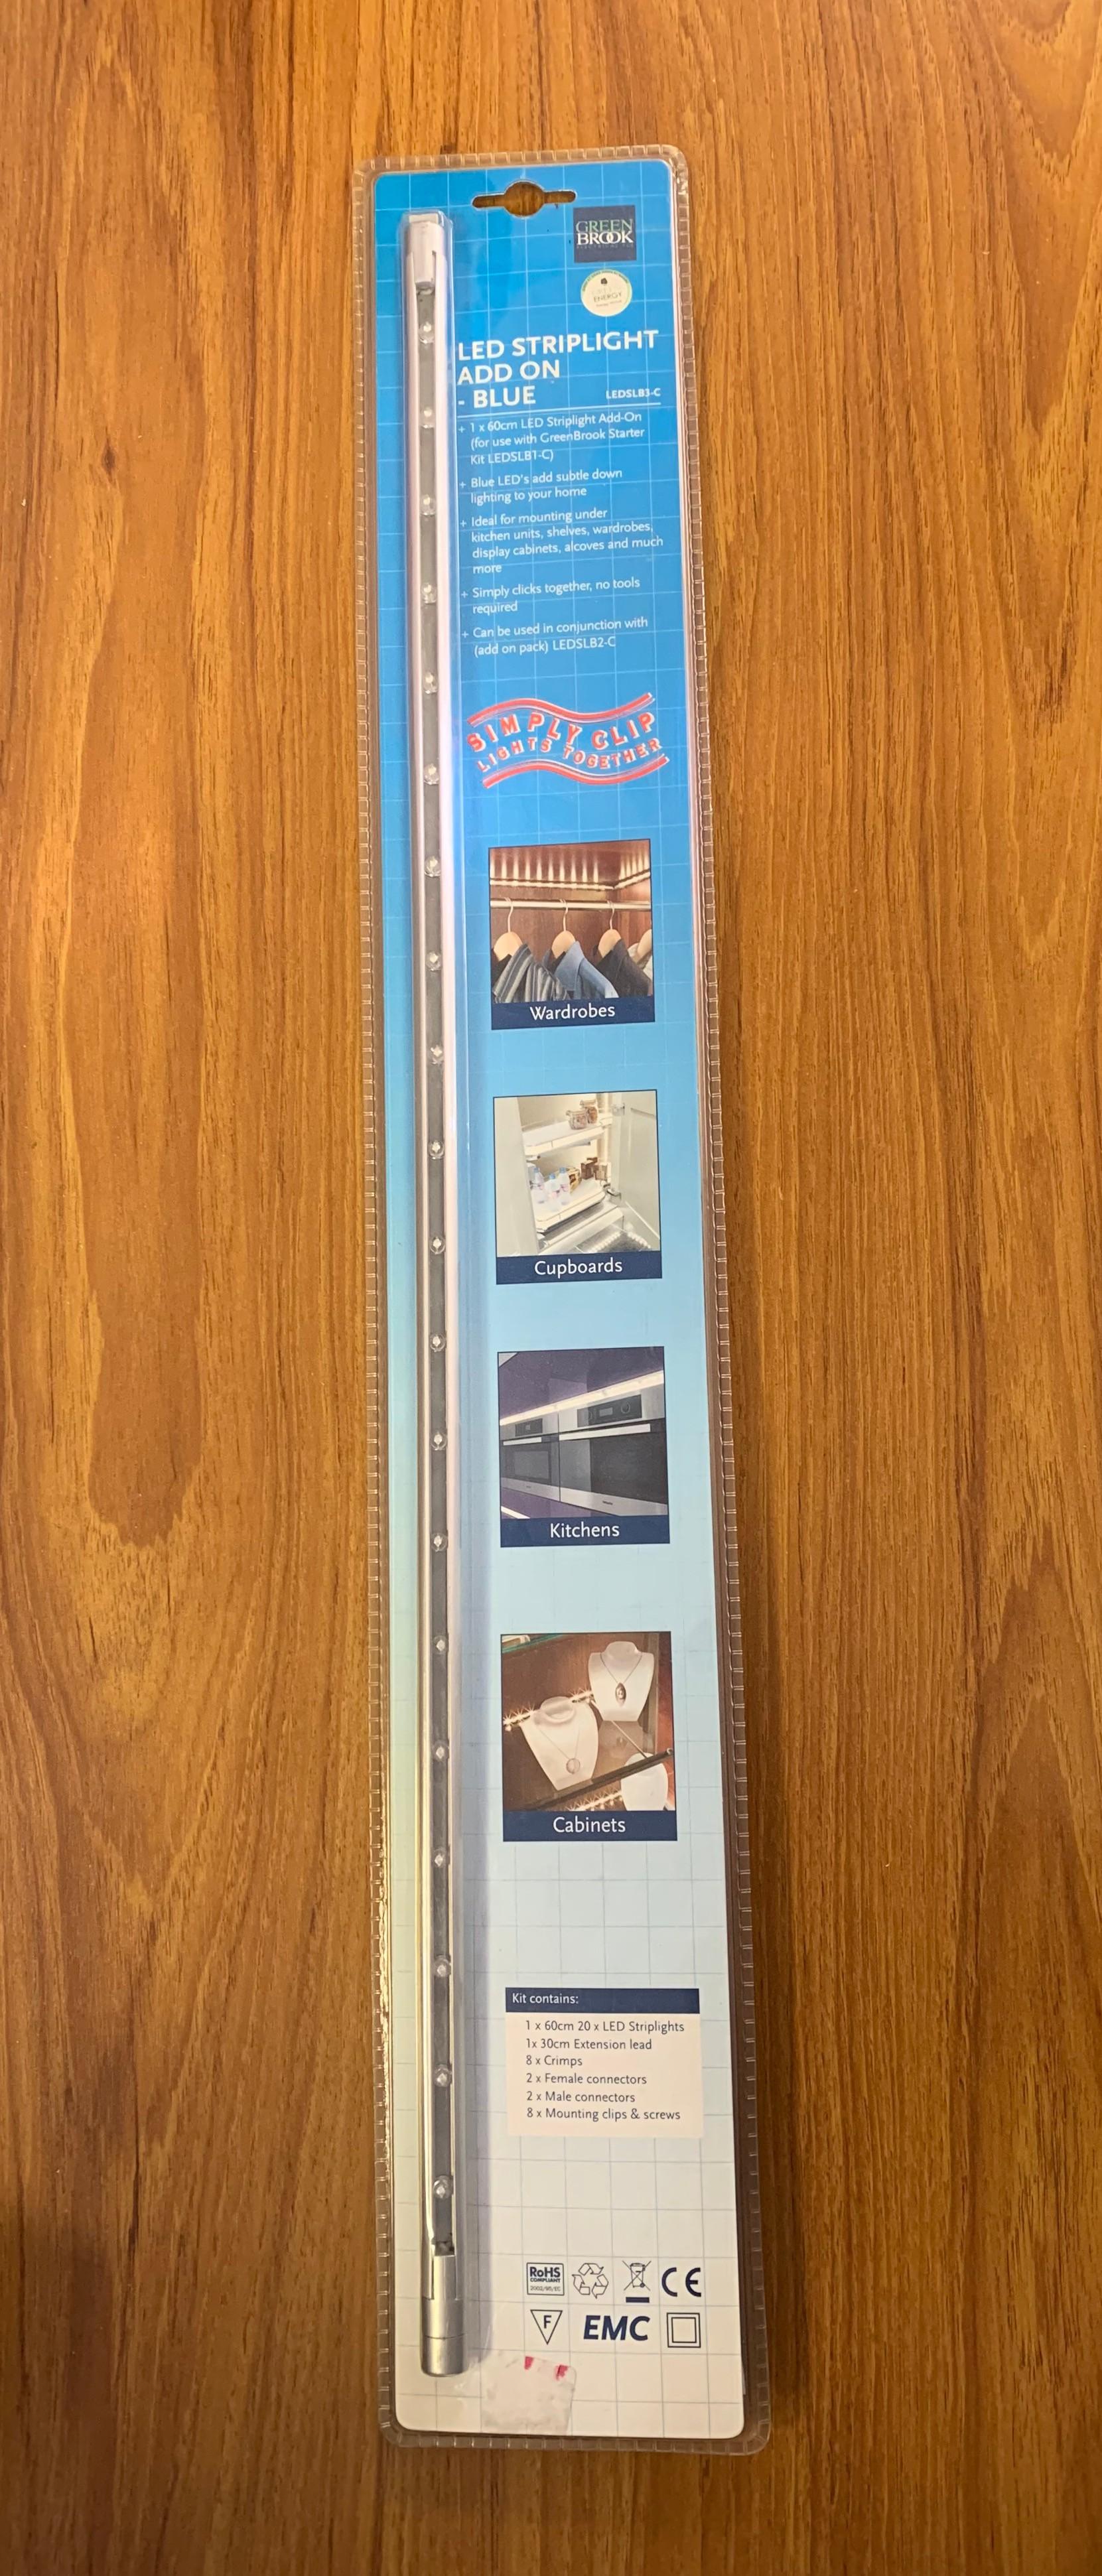 GreenBrook LEDSLB3-C LED Striplight Add On- Blue - Buy online or in store from John Cribb & Sons Ltd